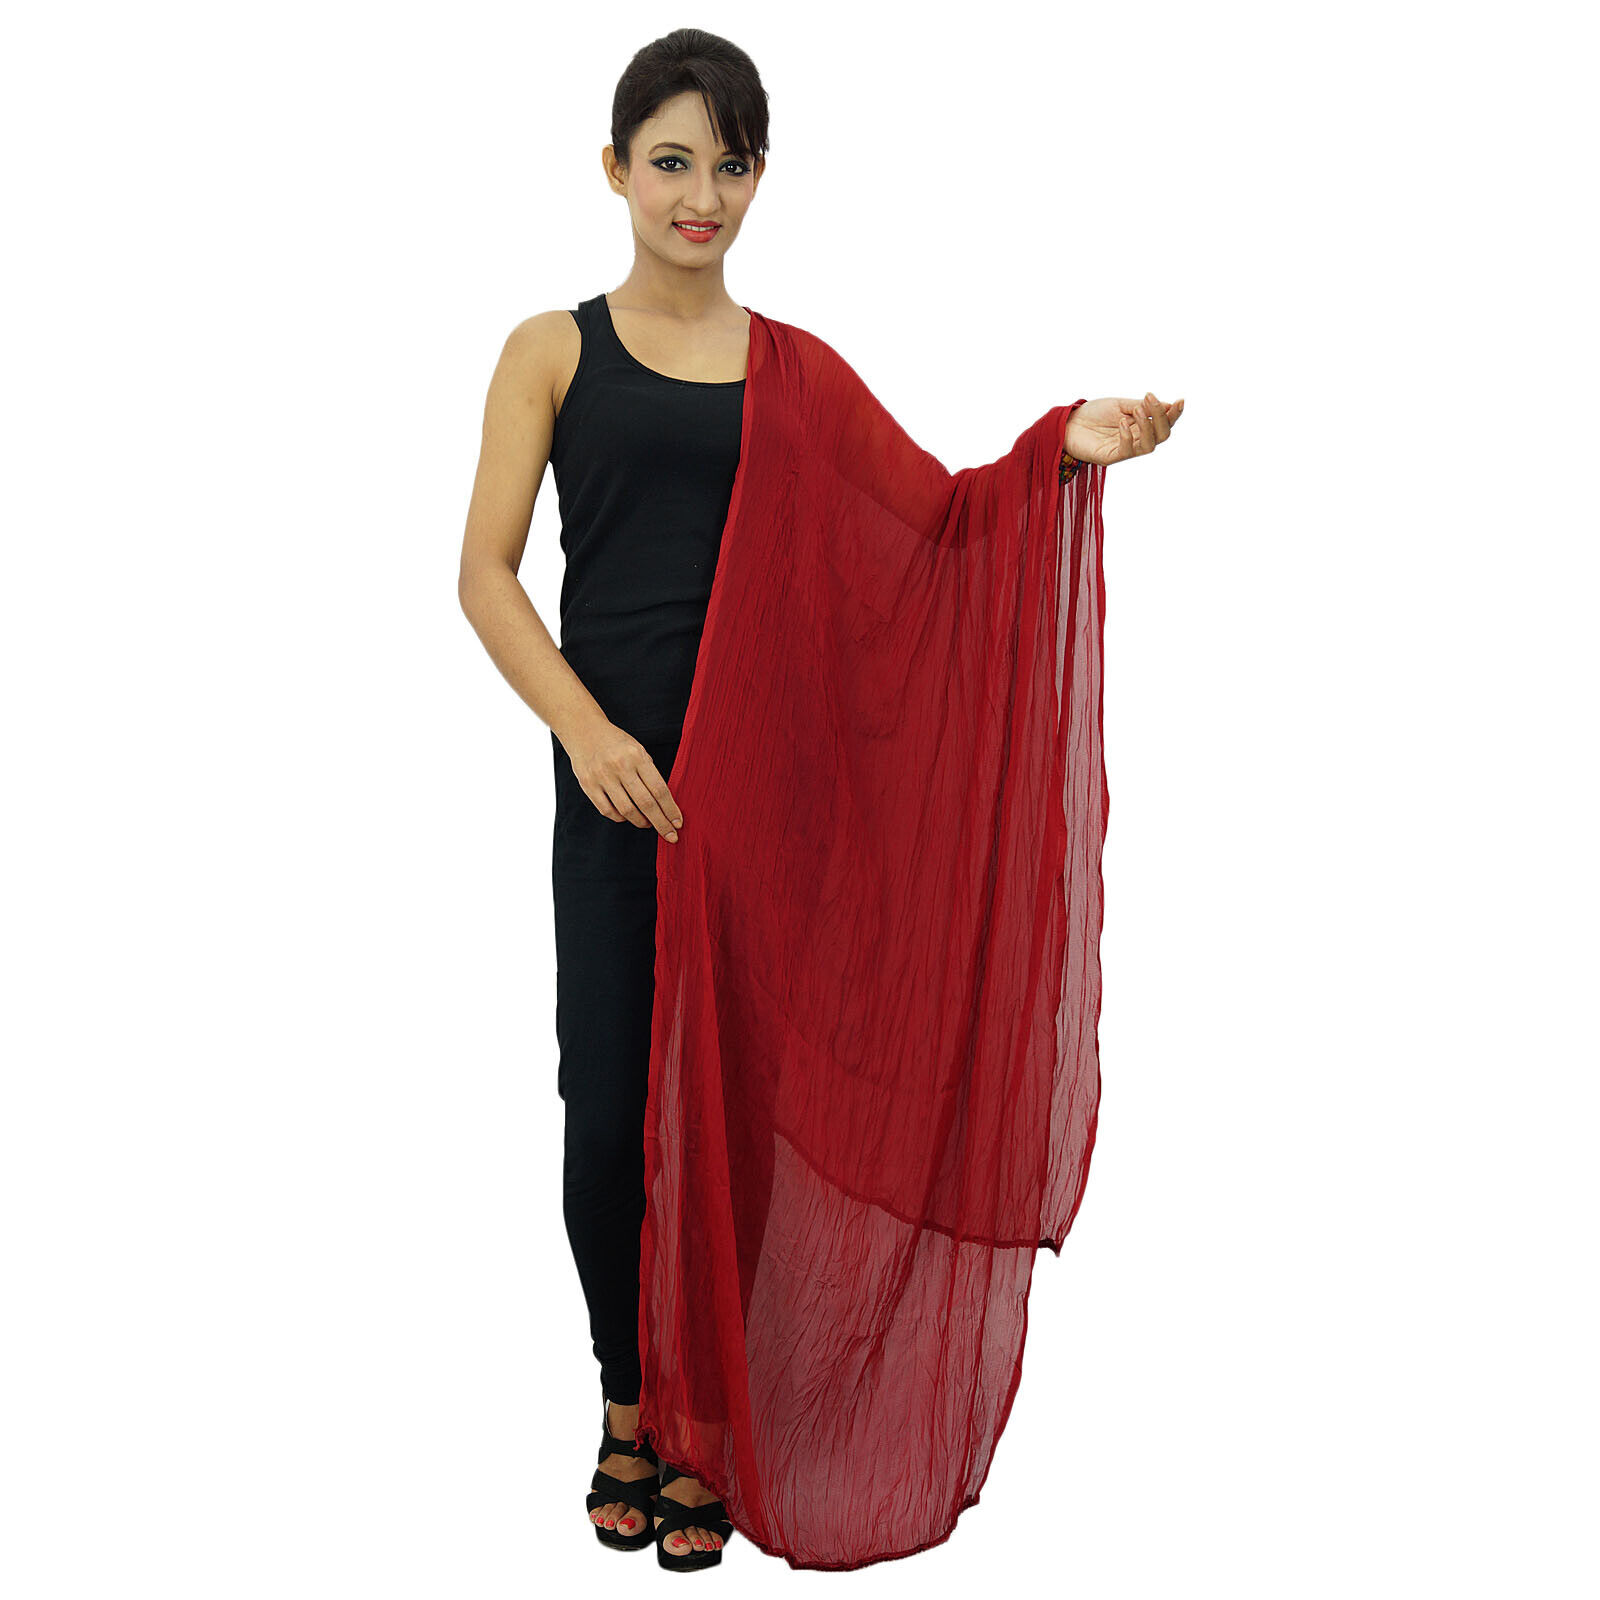 Chiffon Blend Dupatta Neck Wrap Women Wear Long Stole Indian Scarves-bXZ